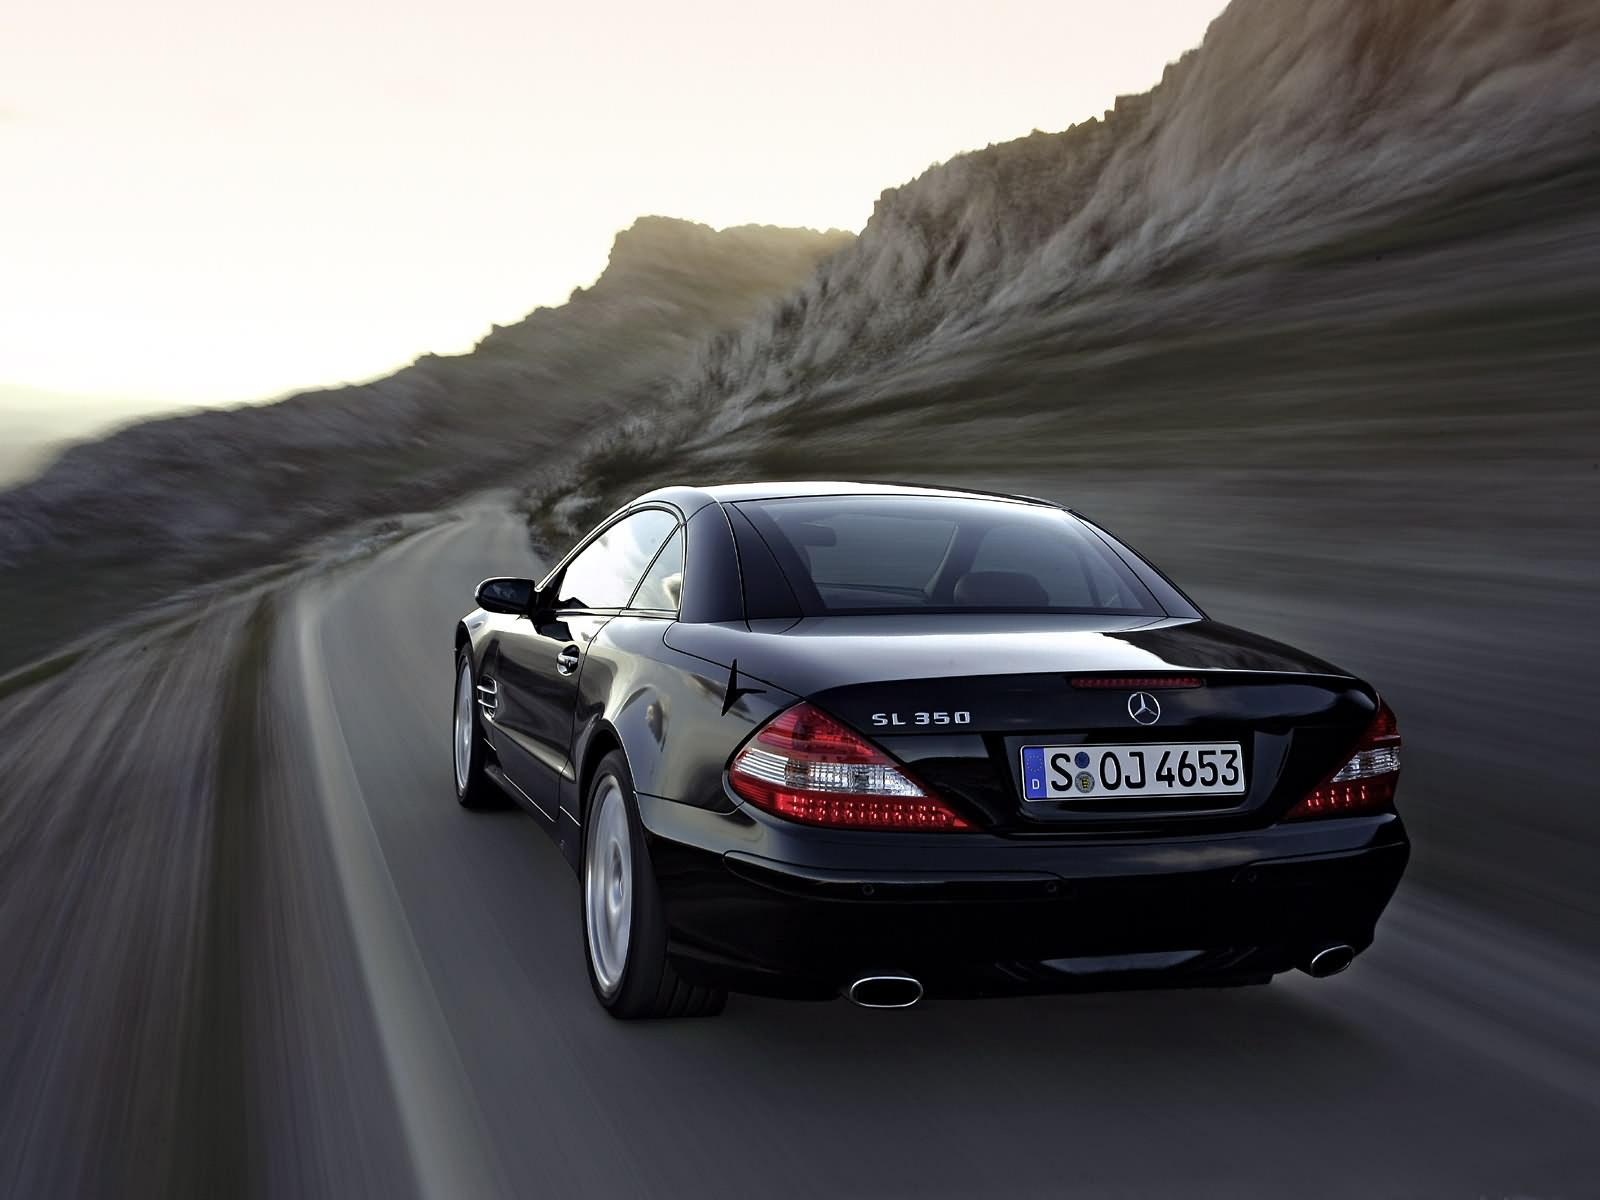 Mercedes benz e 300 bluetec hybrid challenge 2012 hd for 2006 mercedes benz e350 reviews